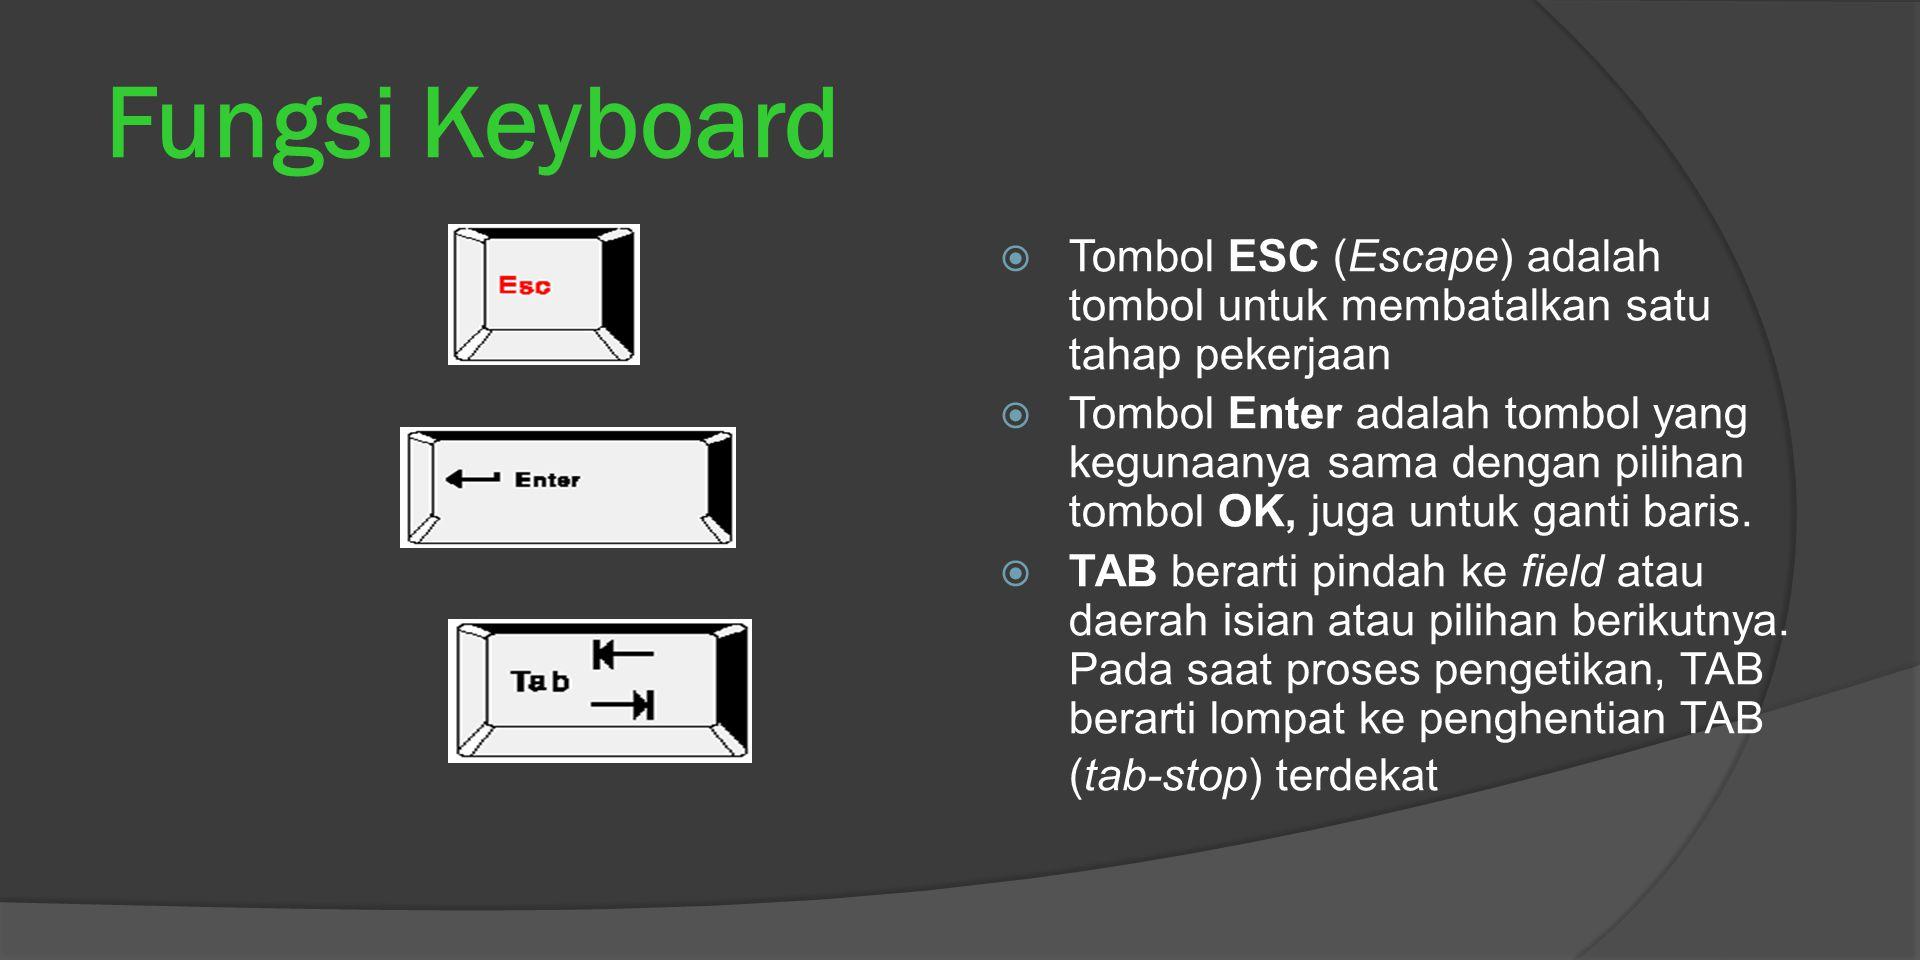 Fungsi Keyboard  Tombol ESC (Escape) adalah tombol untuk membatalkan satu tahap pekerjaan  Tombol Enter adalah tombol yang kegunaanya sama dengan pilihan tombol OK, juga untuk ganti baris.